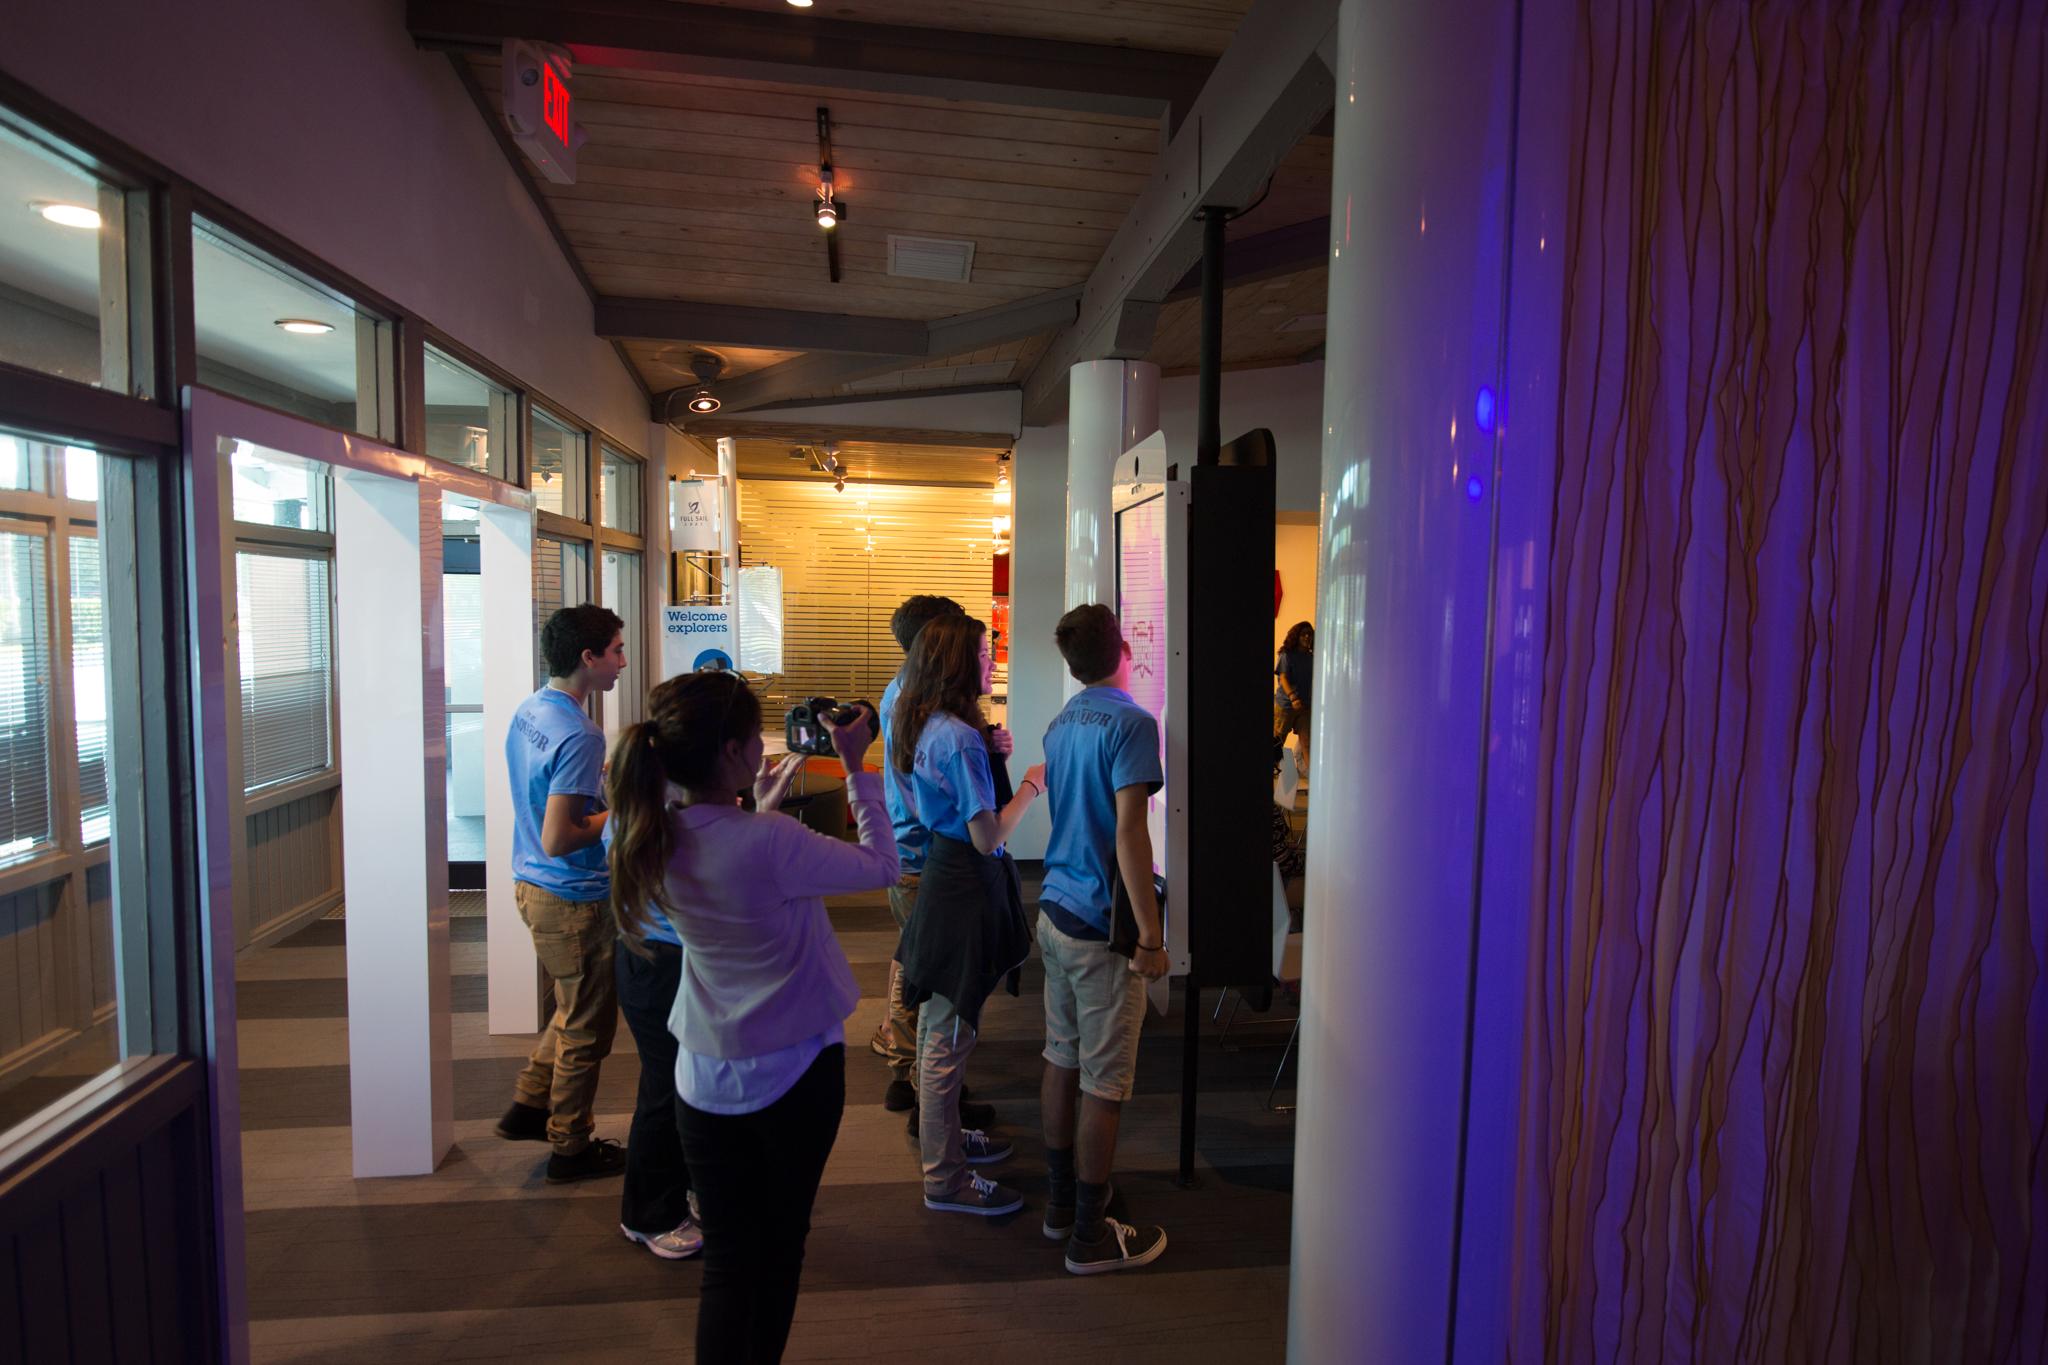 FS_LABS_One_School_of_the_Arts_Aug.24_05.jpg